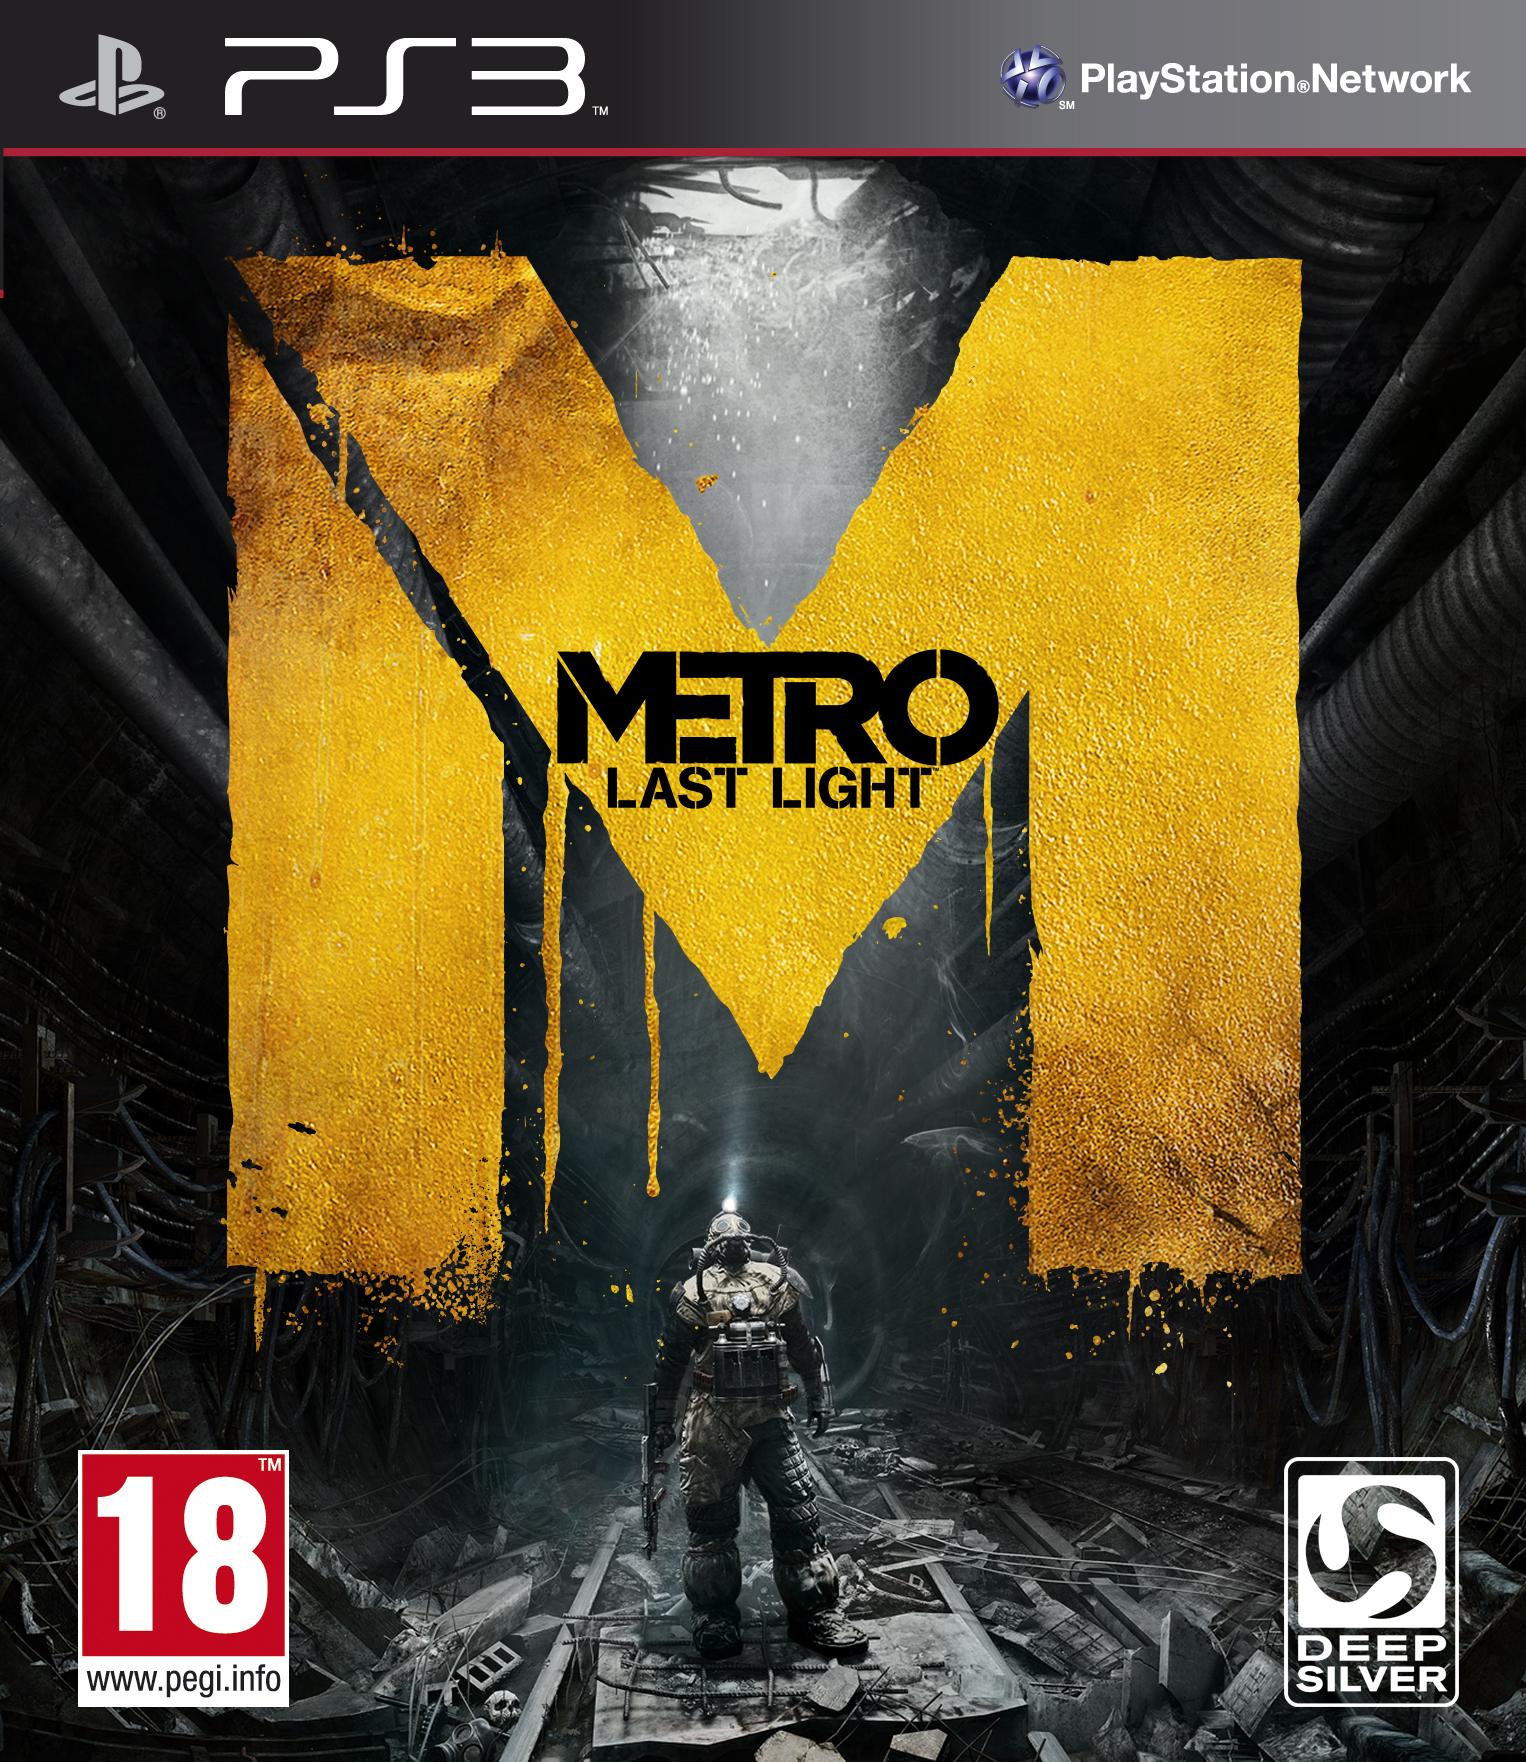 Metro Last Light Packshot Neu Metro: Last Light   Deep Silver gibt Release ab Mai 2013 bekannt